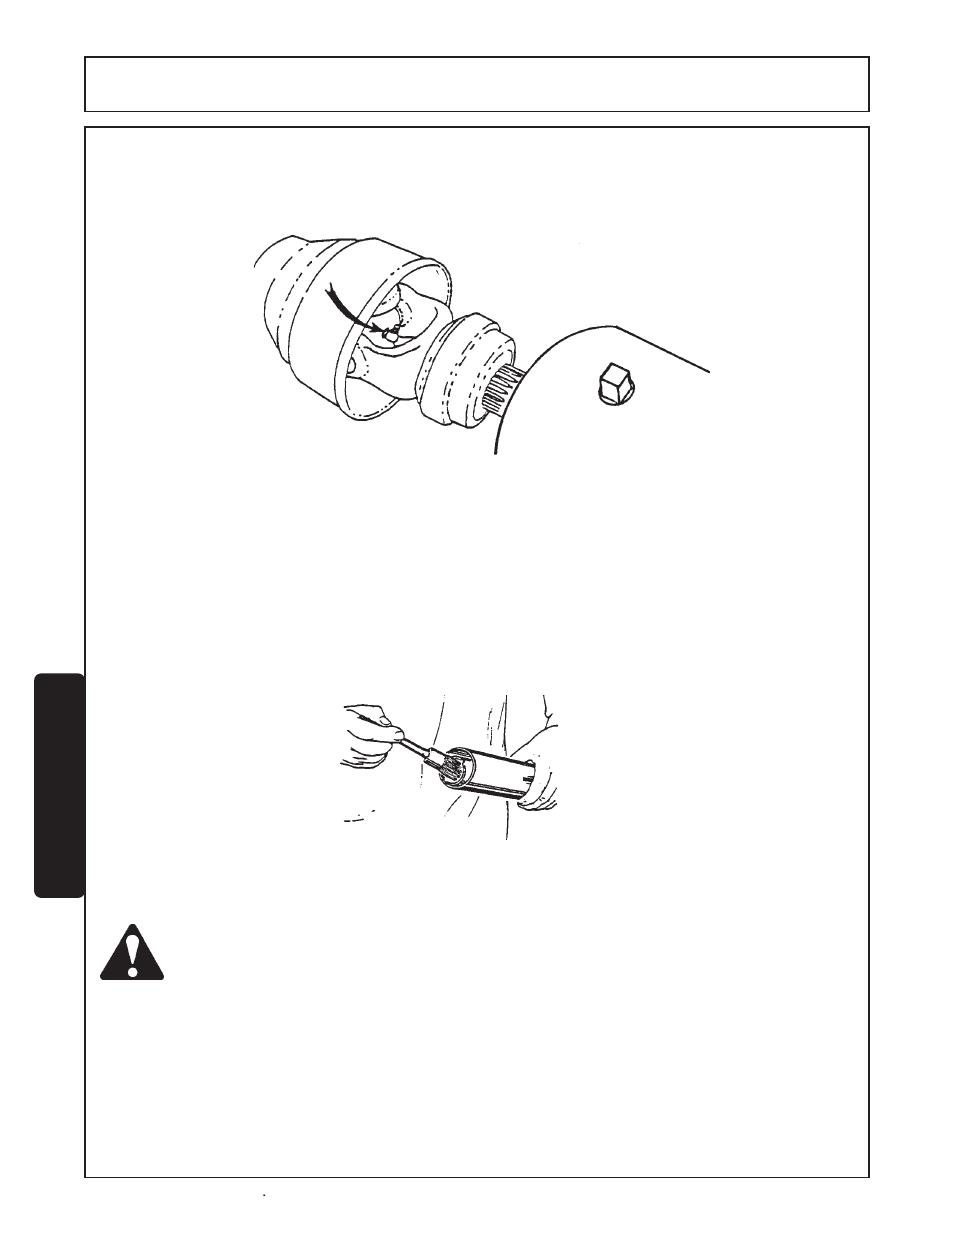 Maintenance | Servis-Rhino FM60/72 User Manual | Page 86 / 100